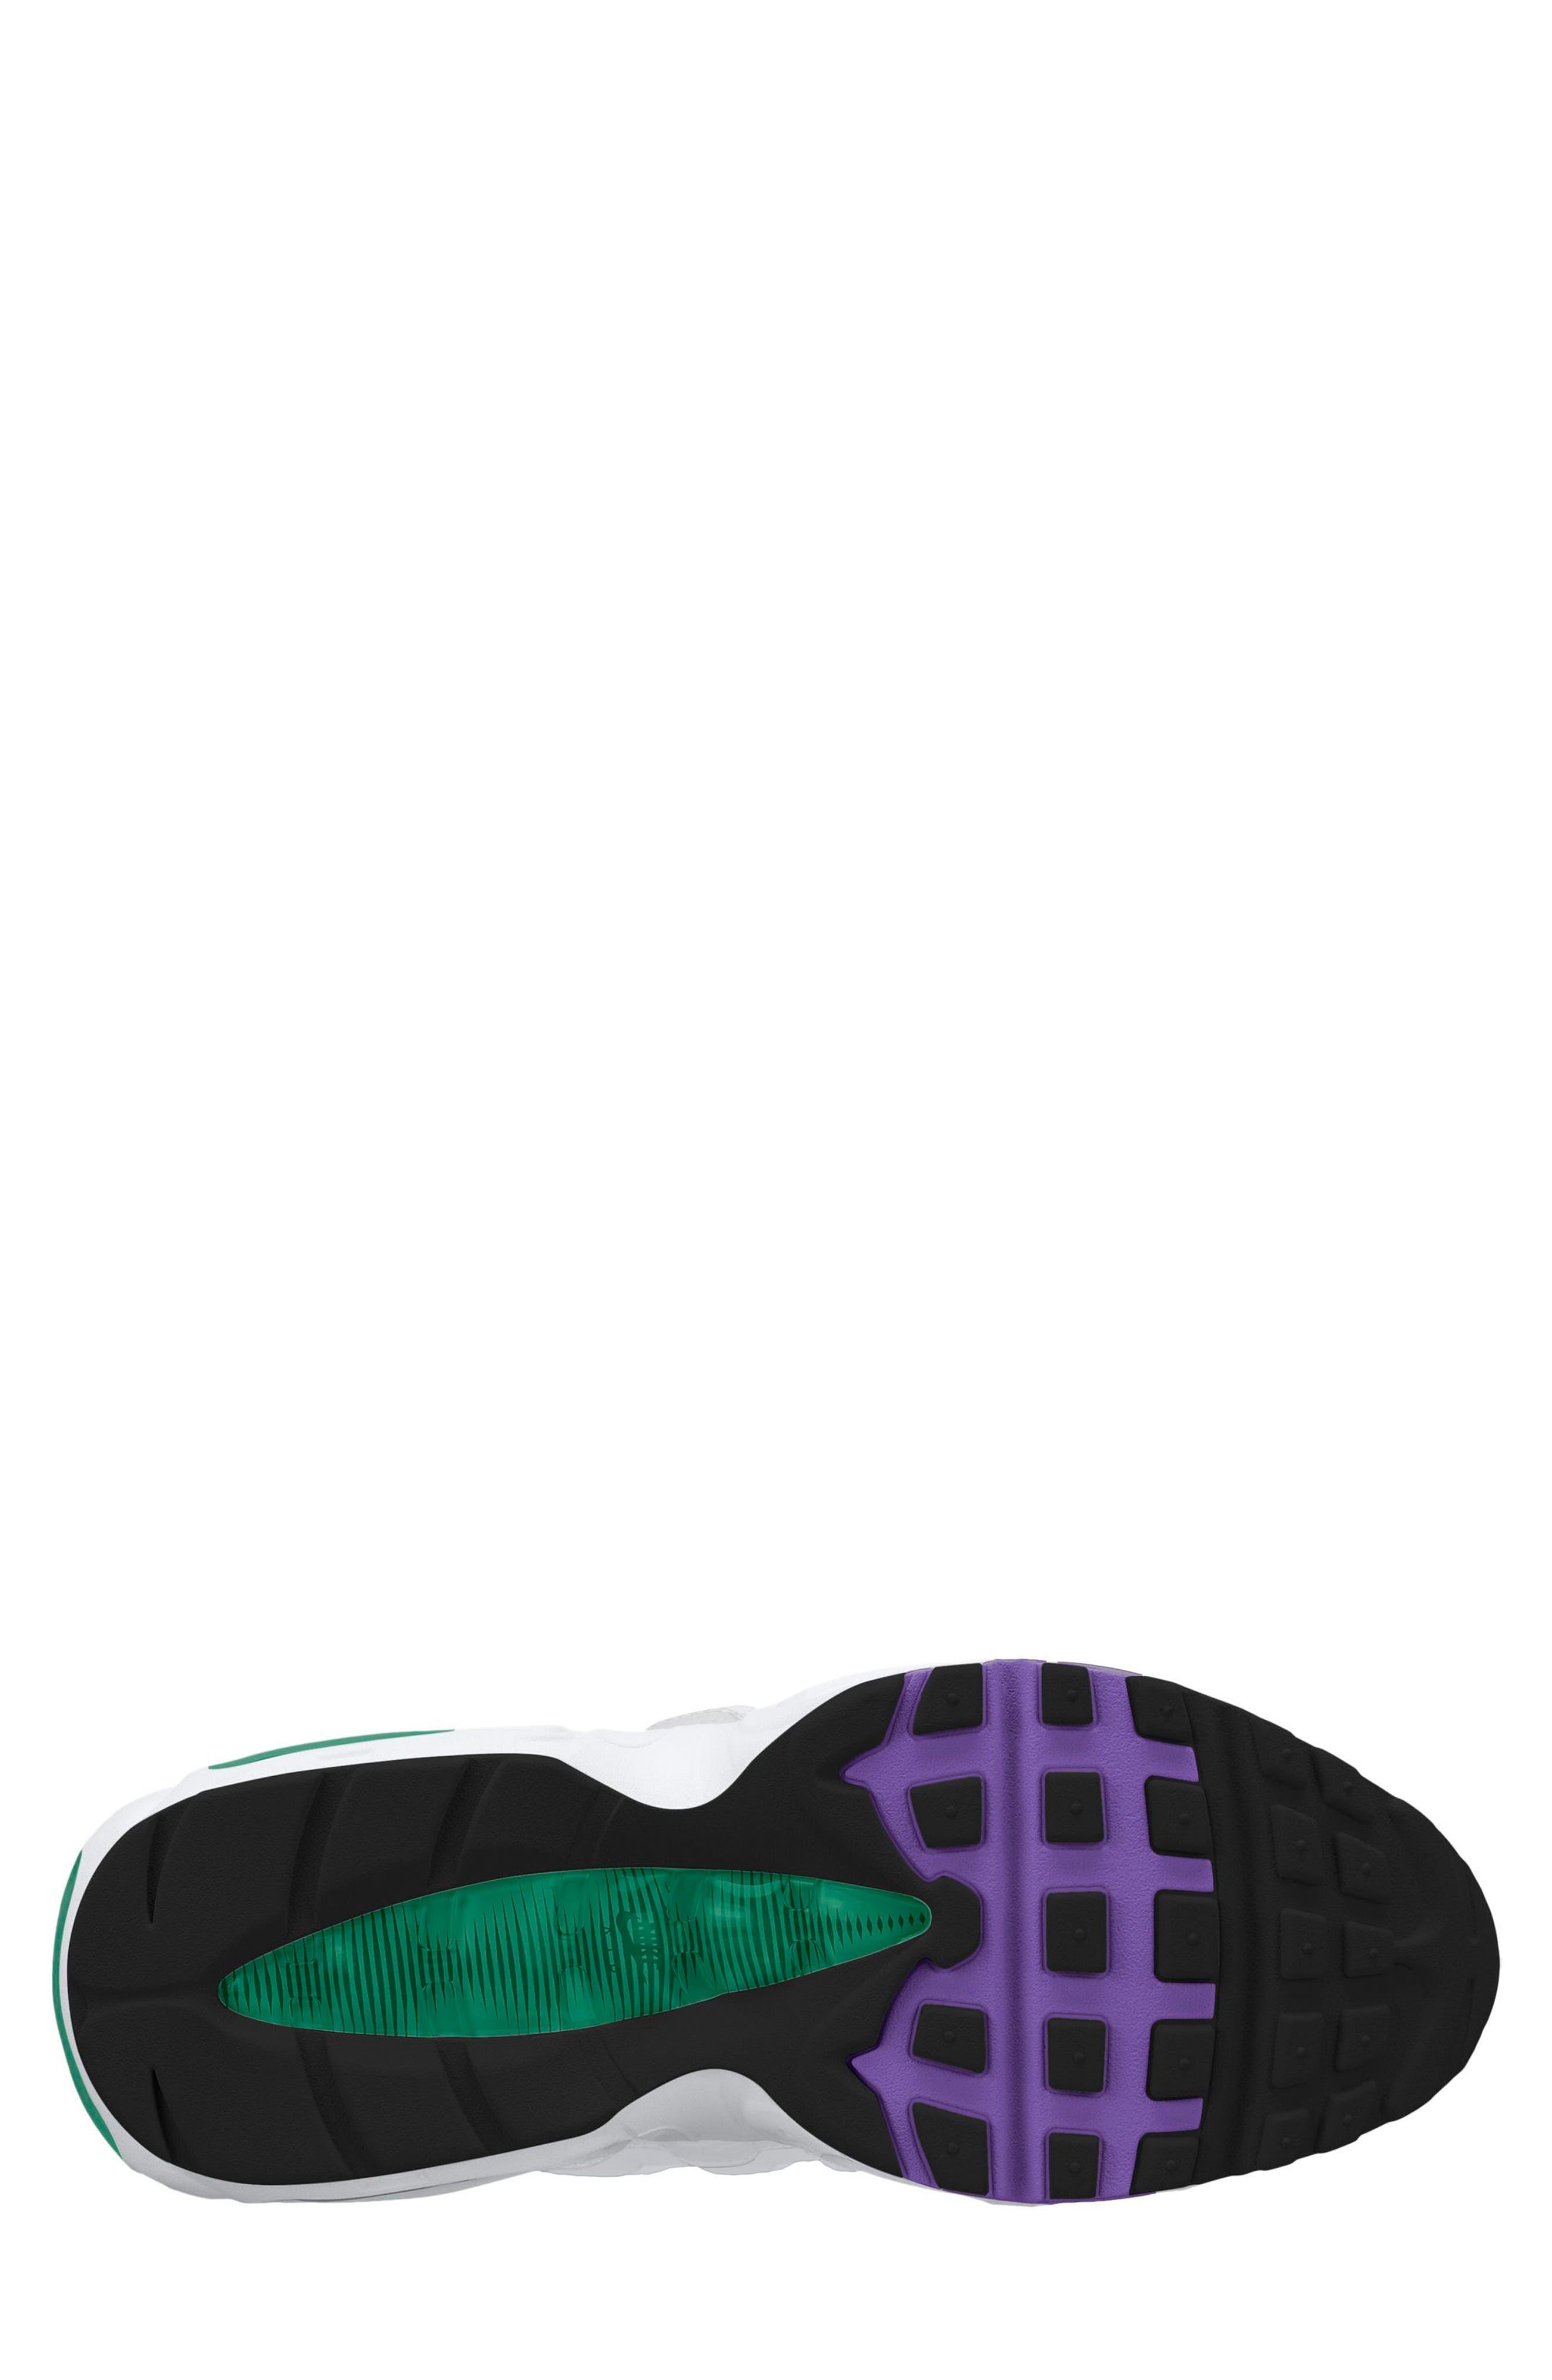 Air Max 95 Running Shoe,                             Alternate thumbnail 2, color,                             White/ Purple/ Emerald Green